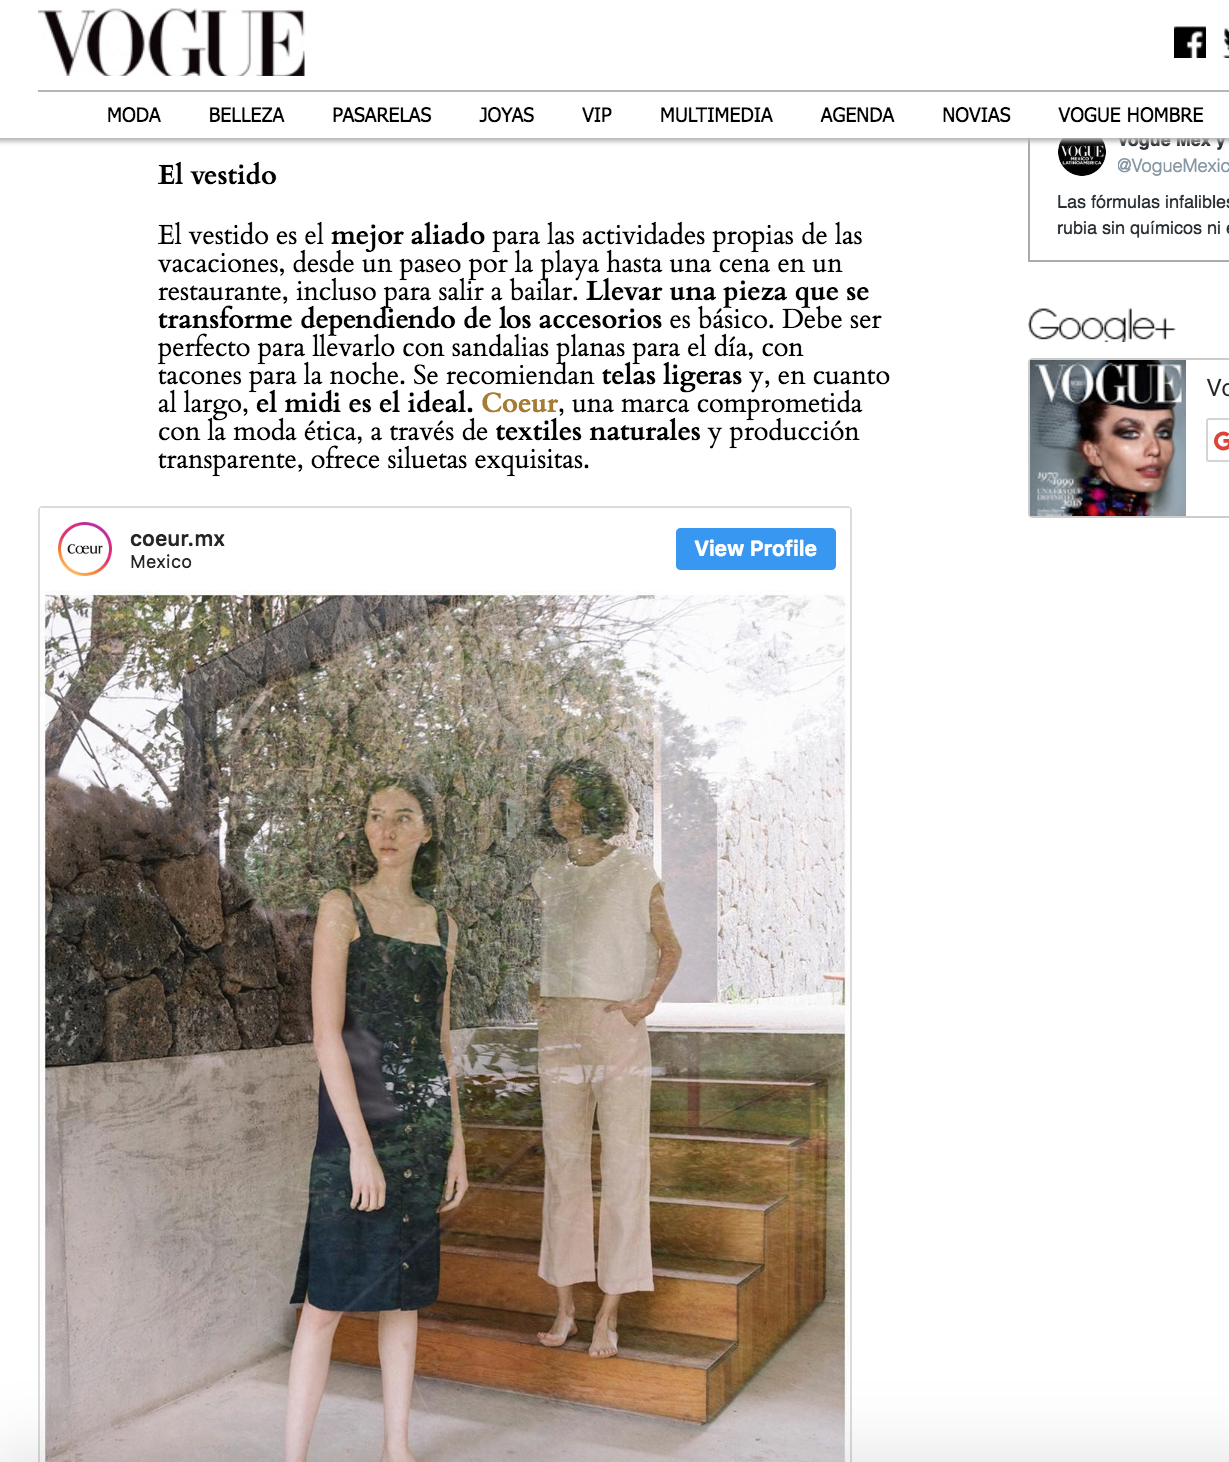 Vogue México y Latinoamérica, Agosto 2018.